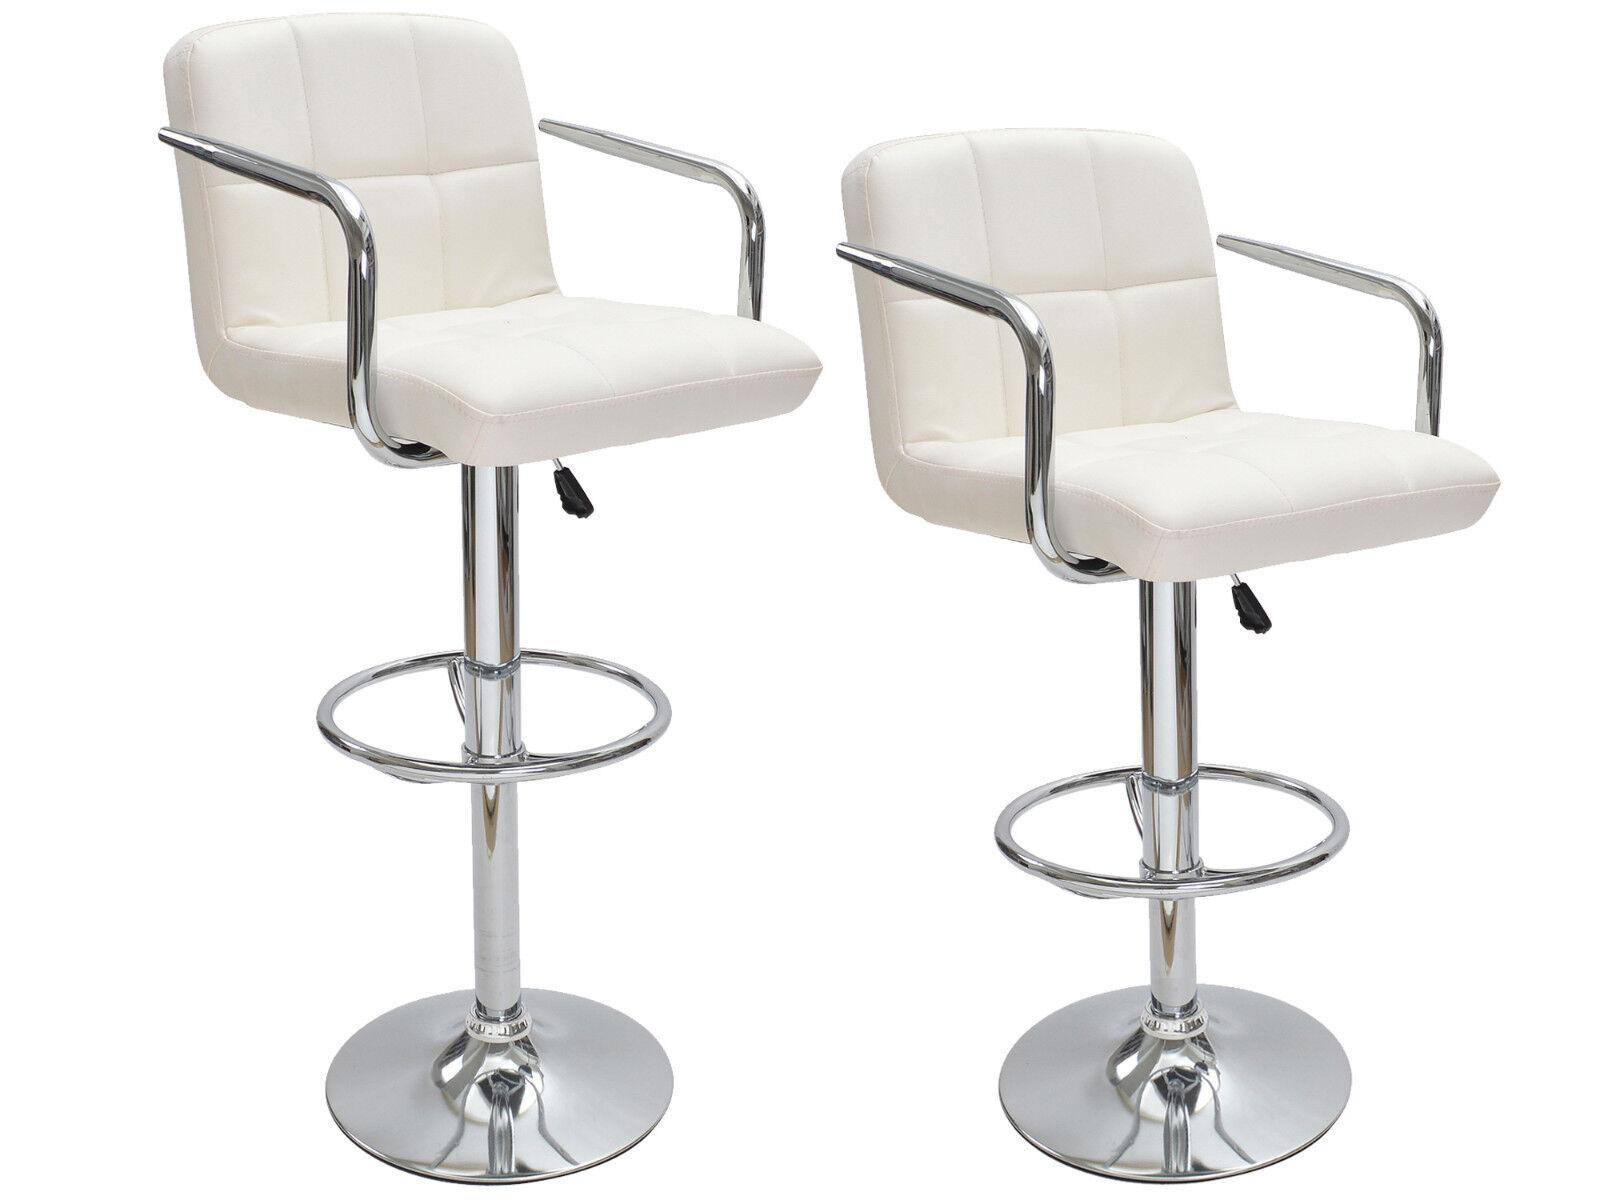 Genial Details About 2 White Bar Stools Leather Modern Hydraulic Swivel Pub Chair  Barstool W/ Armrest